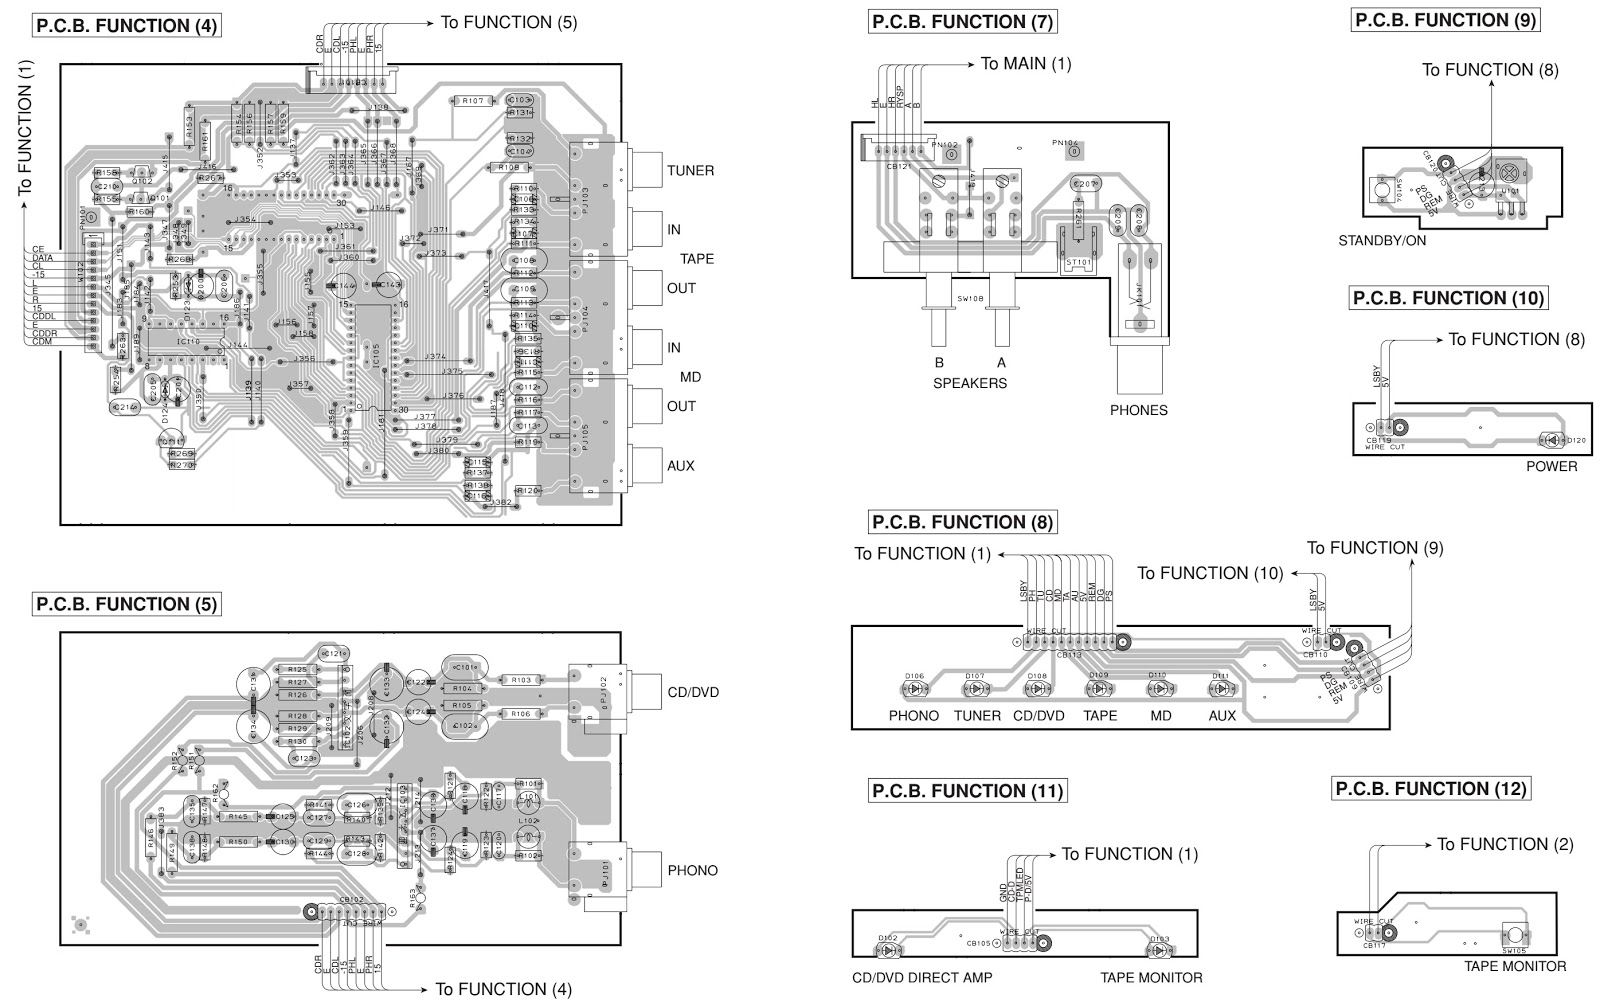 small resolution of yamaha ax396 stereo amplifier circuit diagram yamaha guitar amp schematics yamaha yfz450 service manual